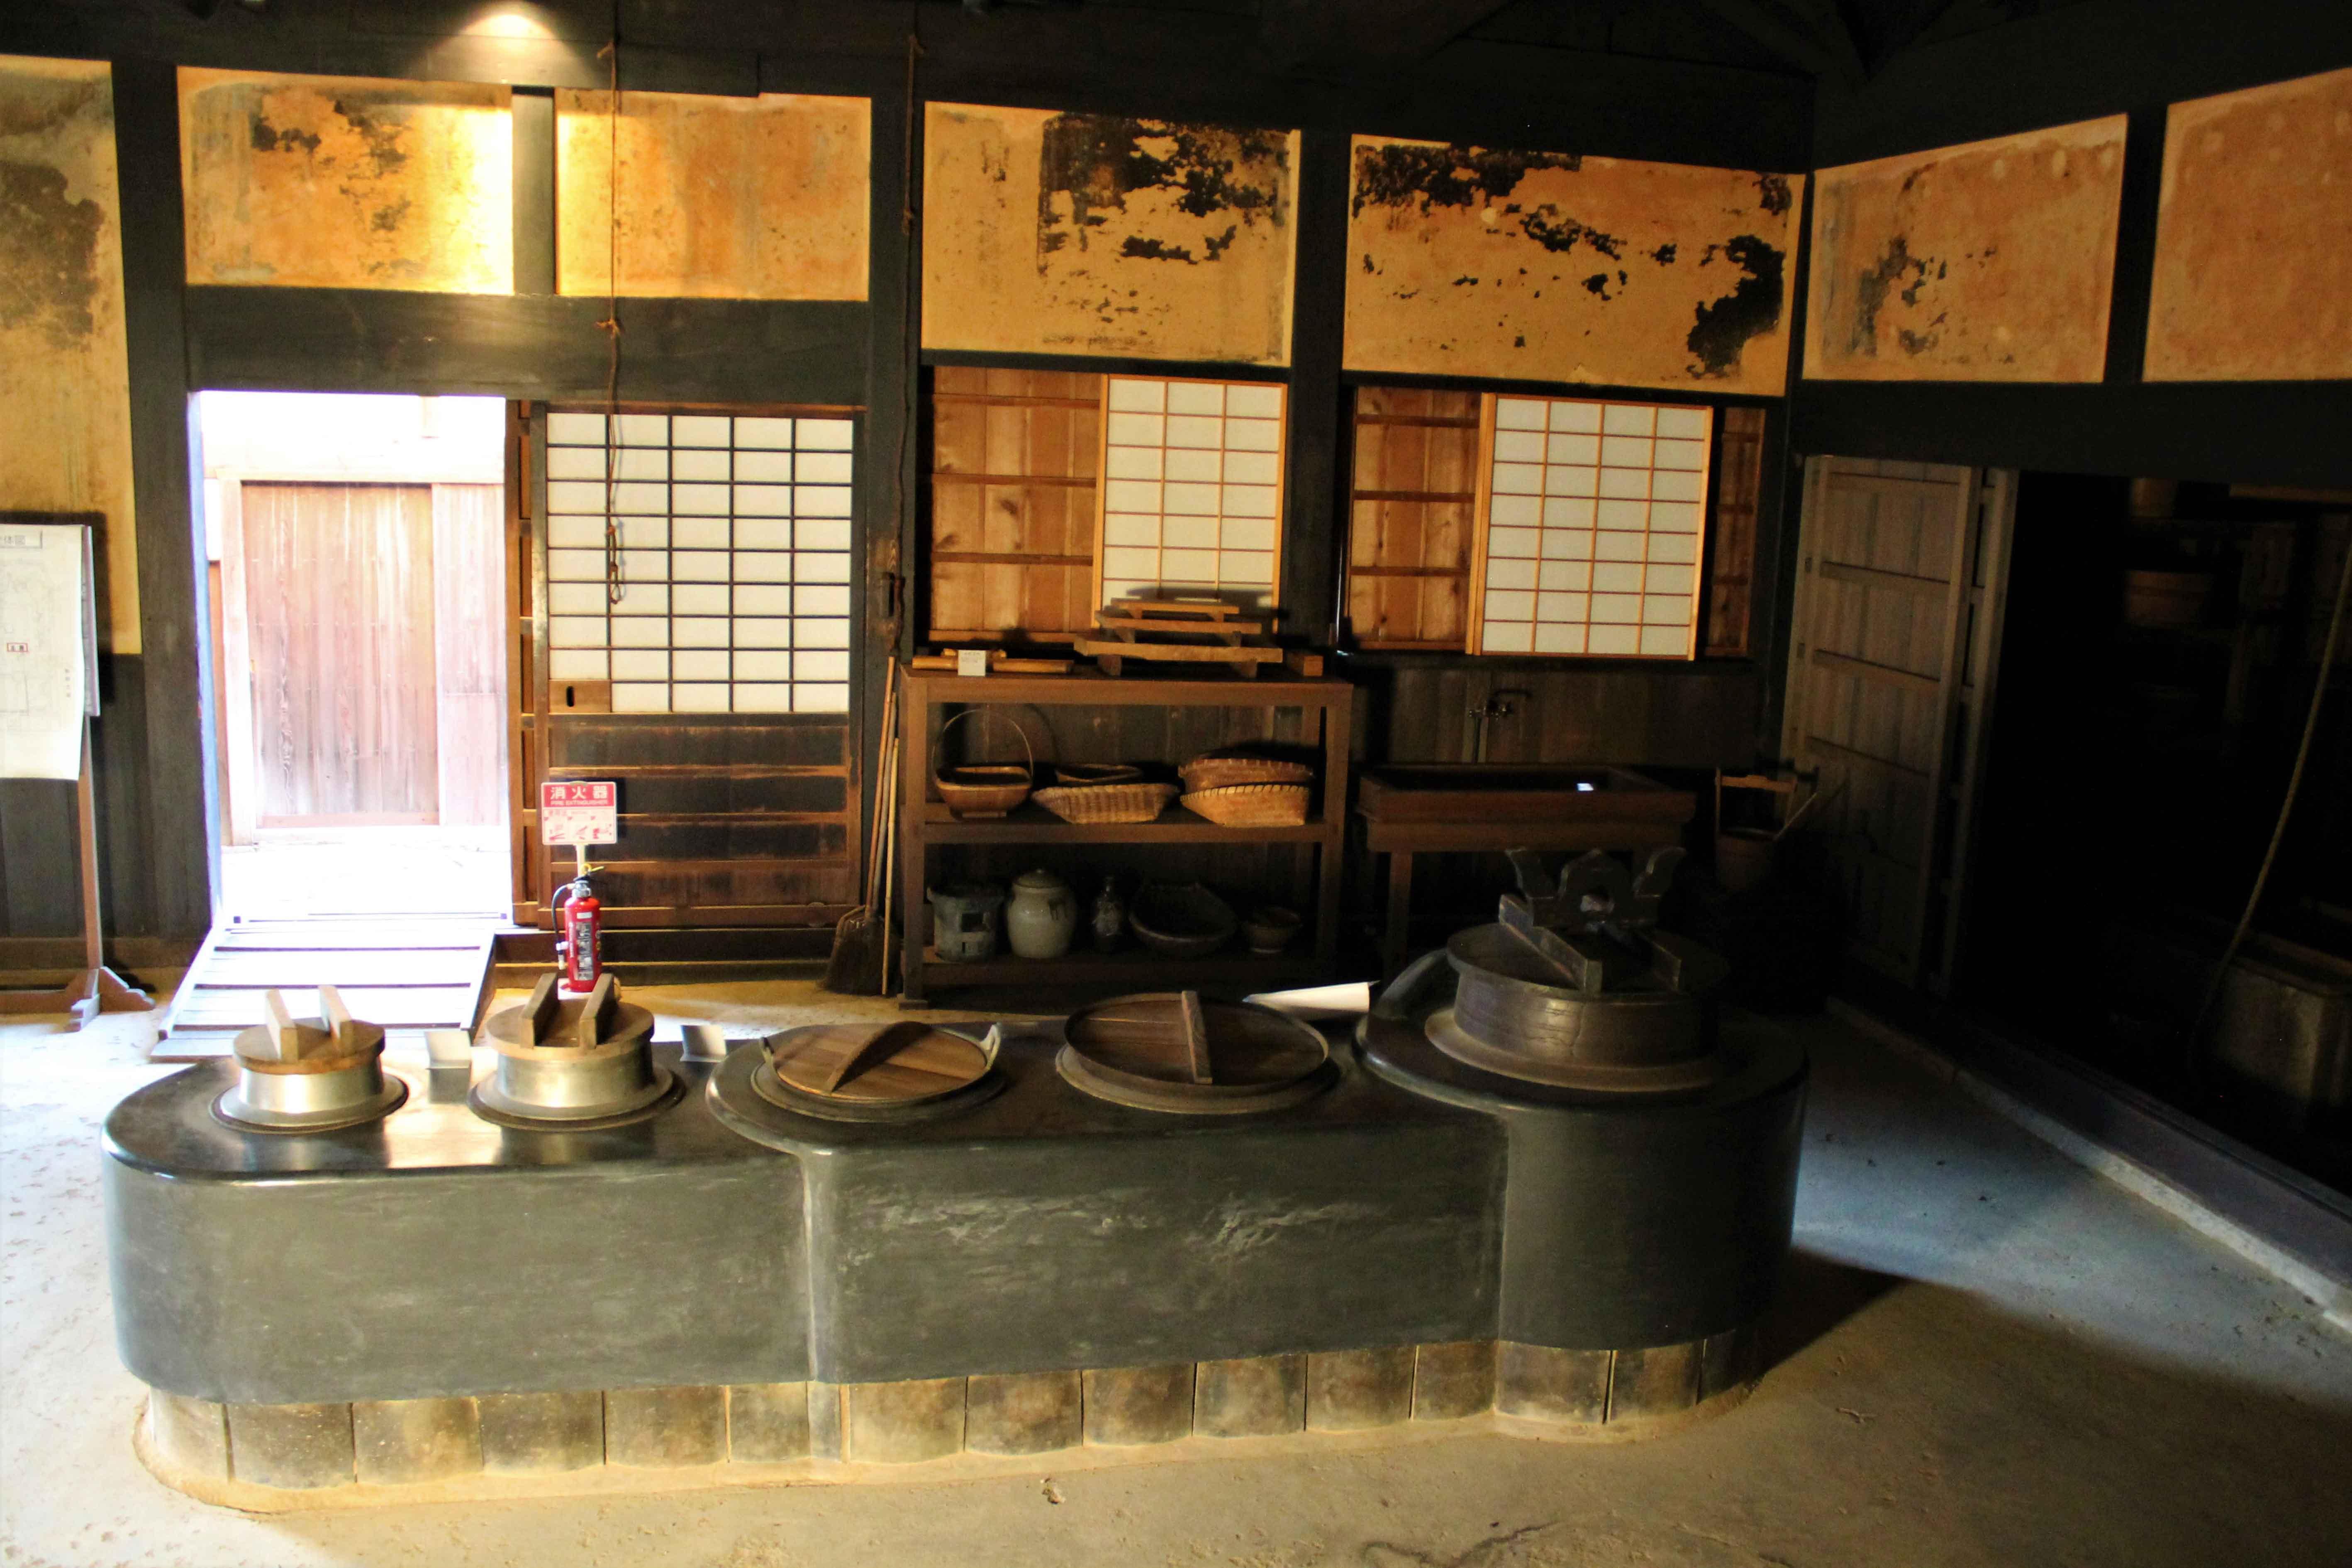 doma(kitchen)の写真